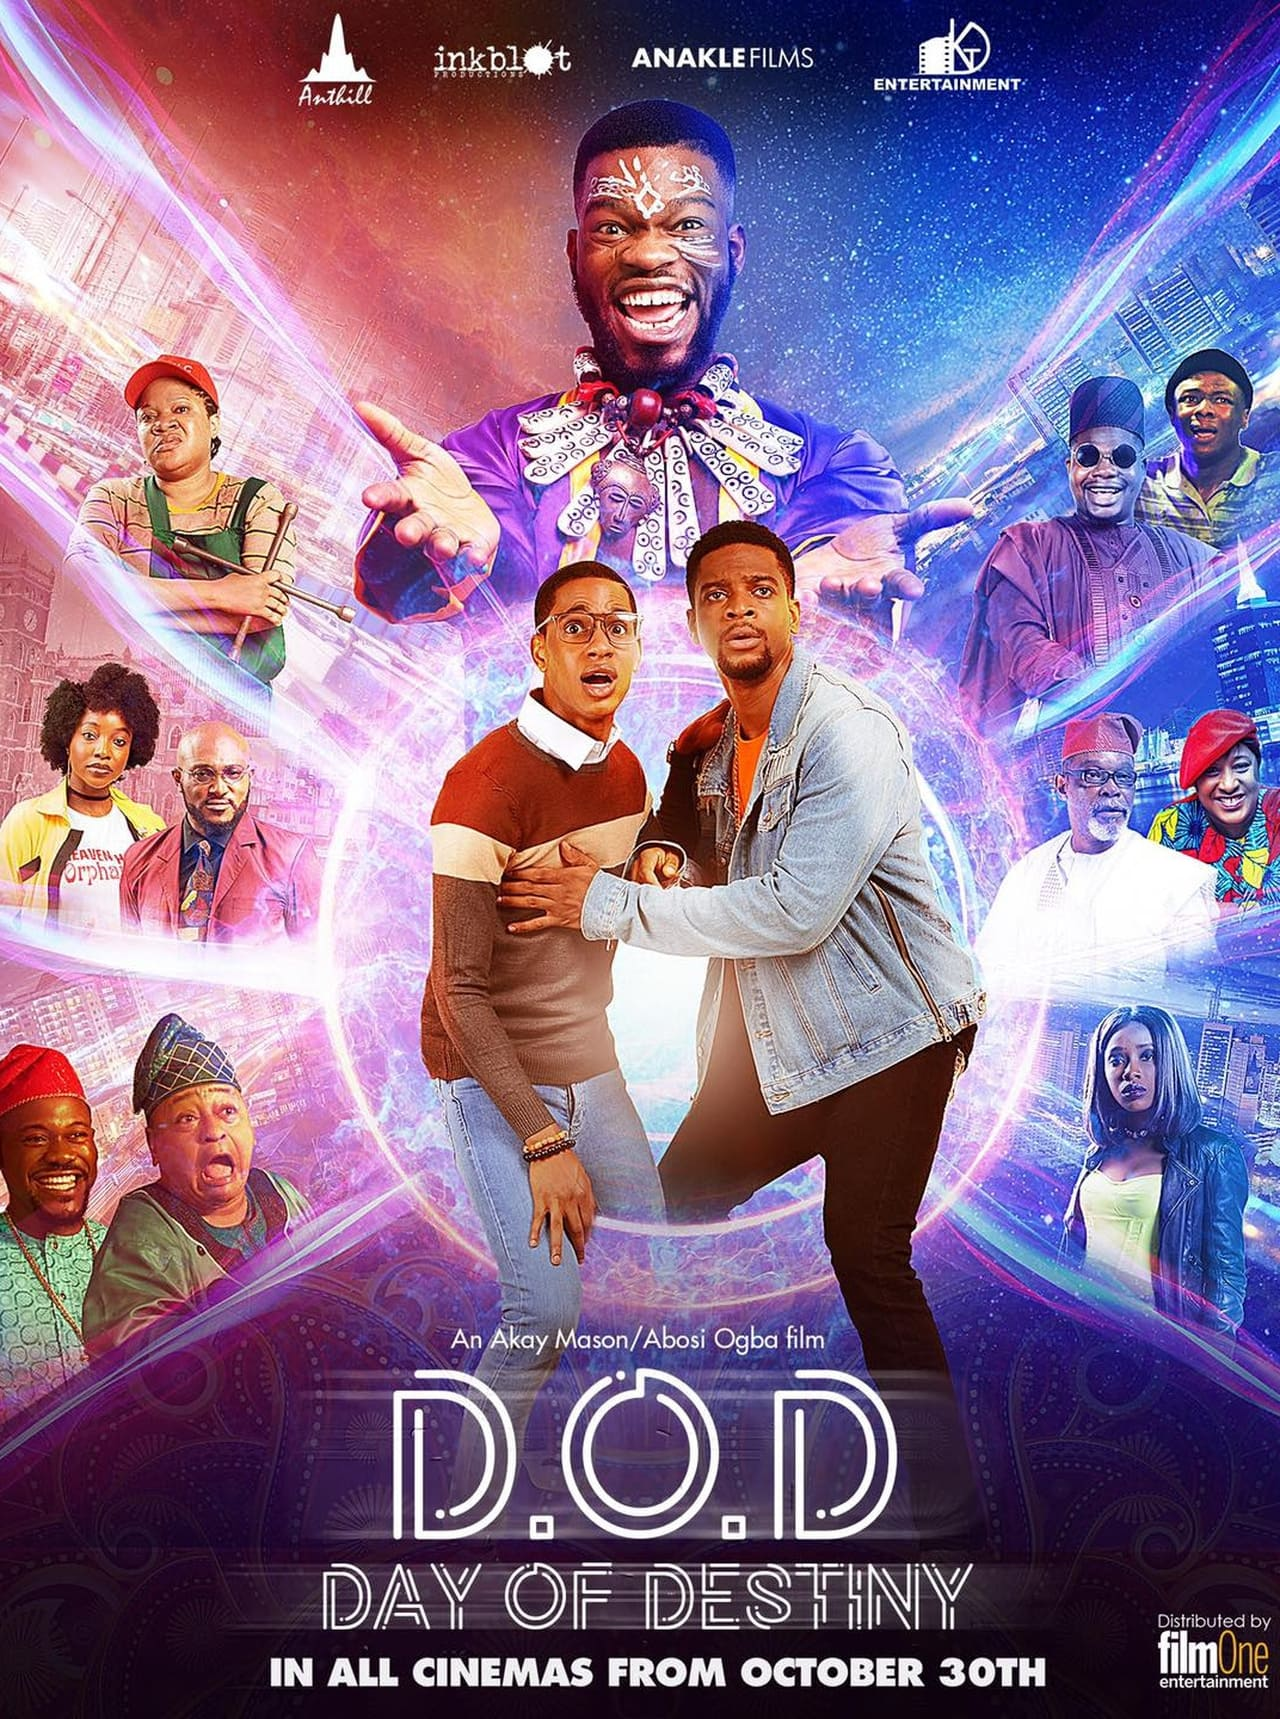 D.O.D.: Day of Destiny